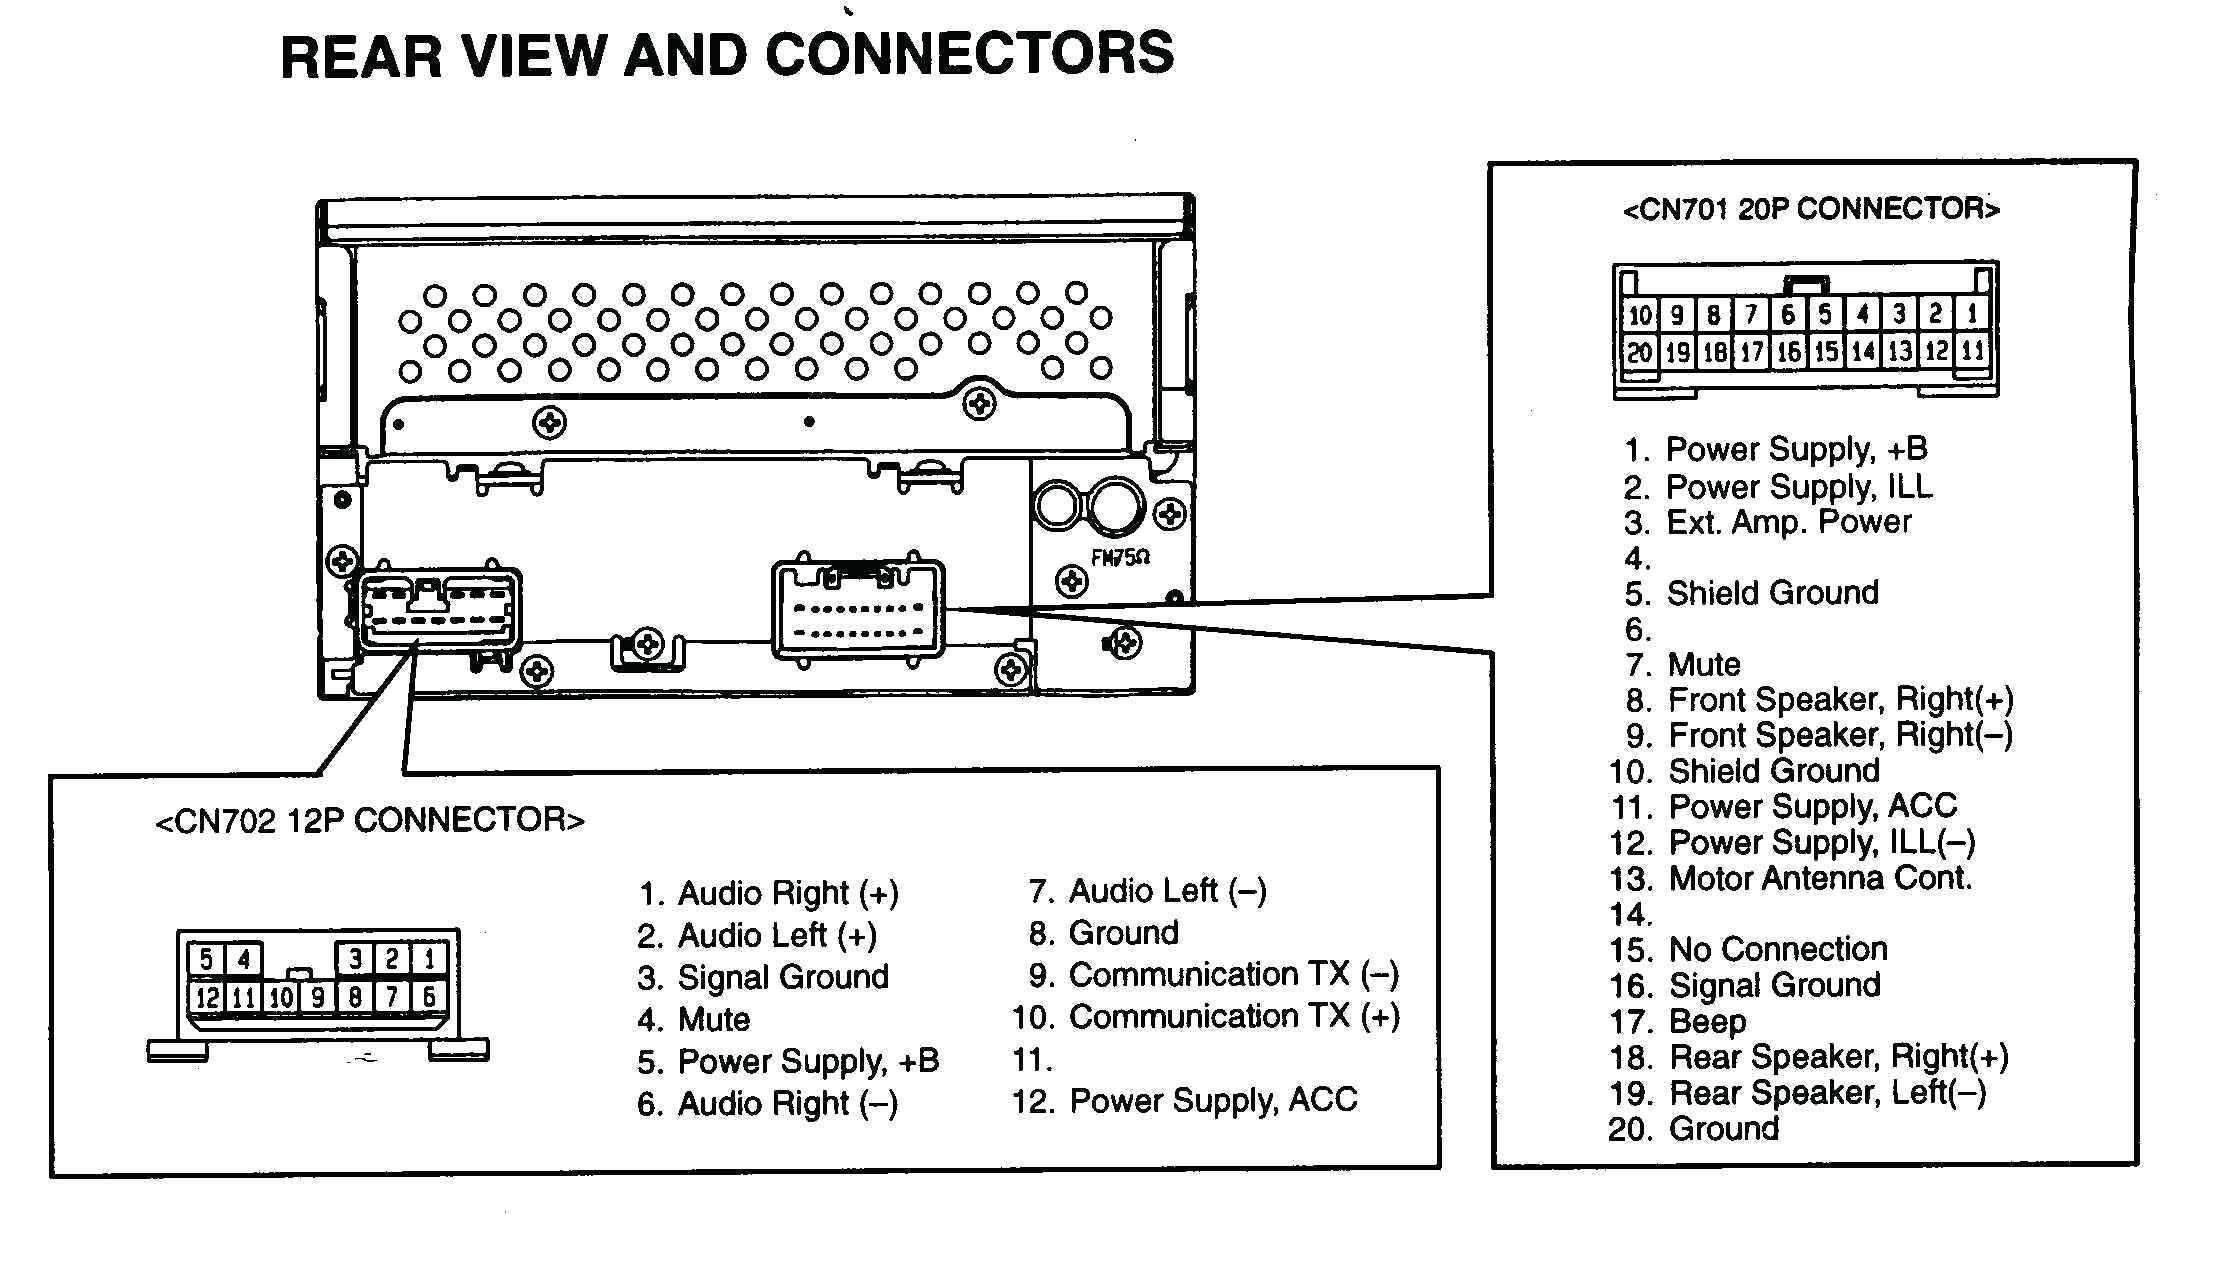 premium bose bose car stereo wiring diagrams custom wiring diagram u2022 rh littlewaves co 2004 silverado radio wiring diagram pdf 2004 chevy silverado 2500hd bose radio wiring diagram